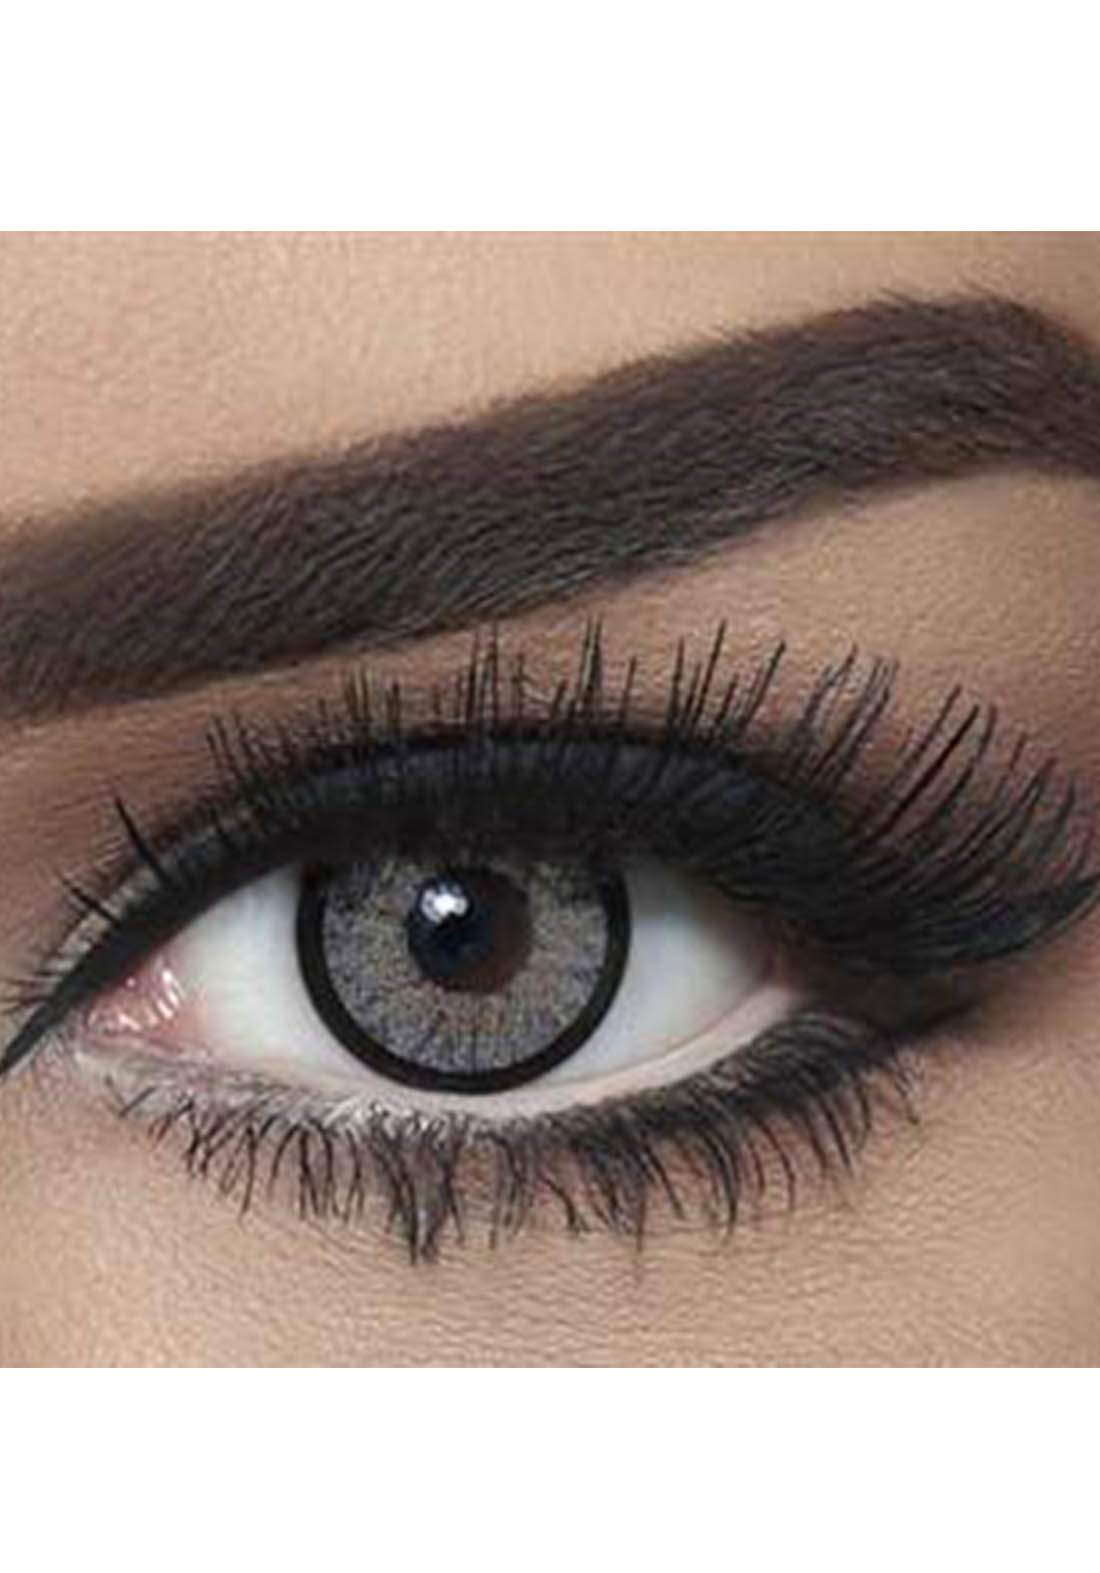 Bella Classic 301014 Contact Lenses 3 Months Use High Light - Cool Gray No.15 عدسات لاصقة